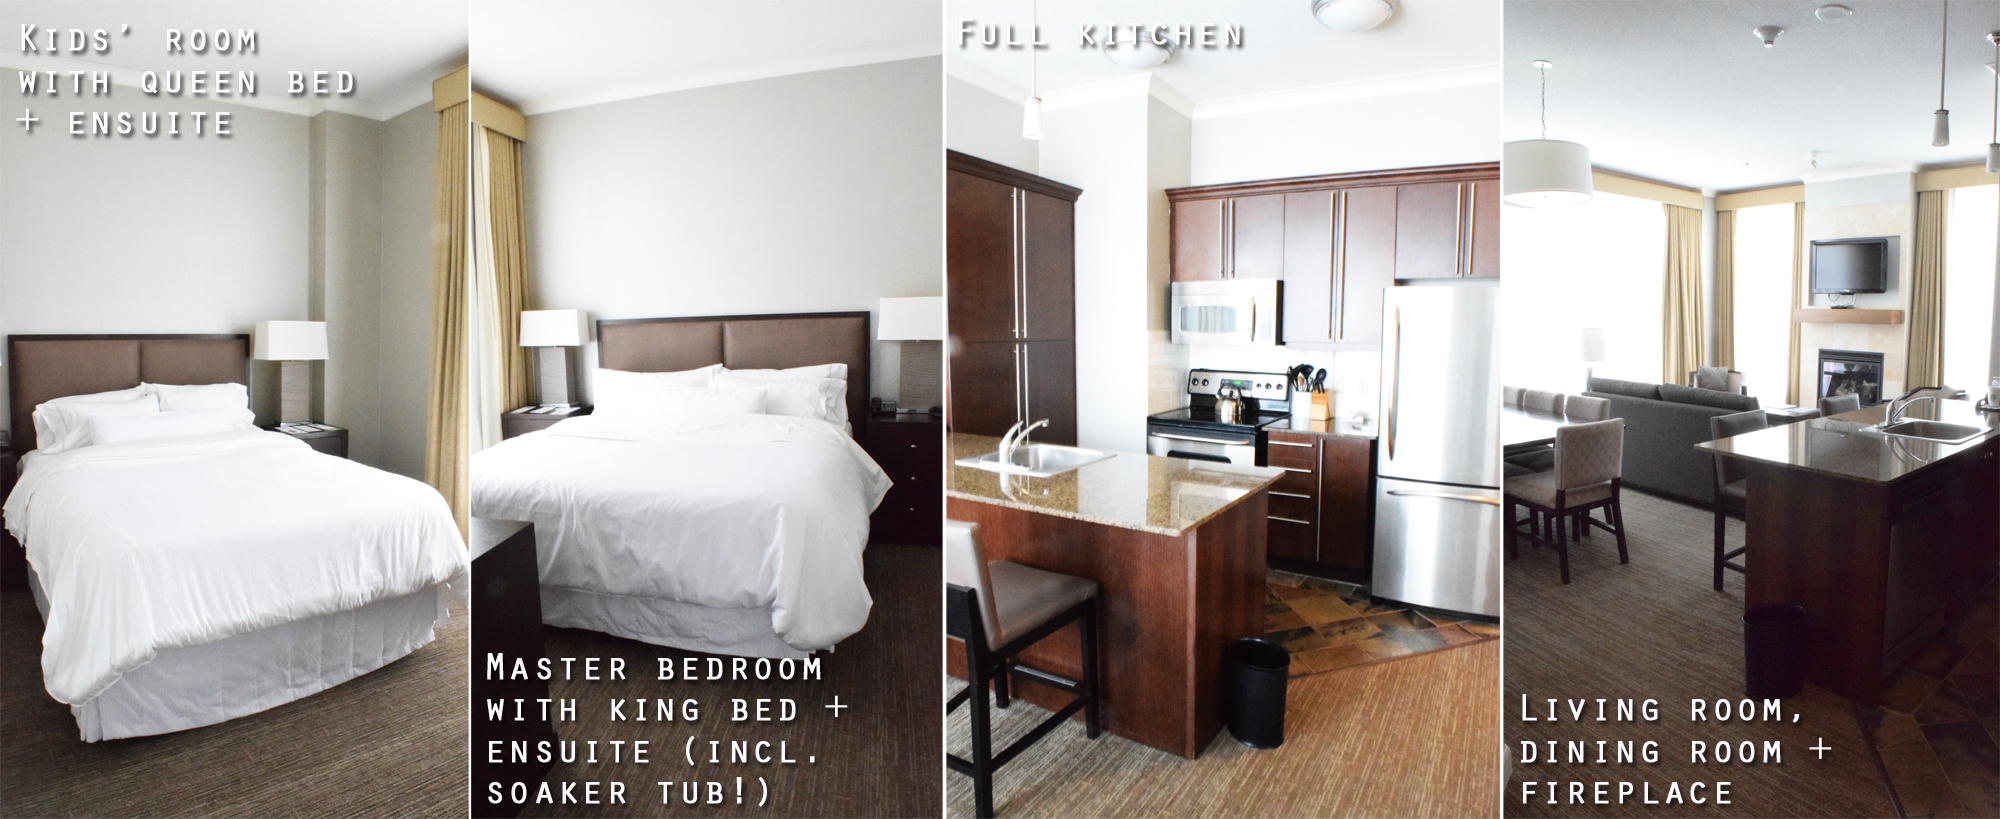 Westin Trillium House two-bedroom suite